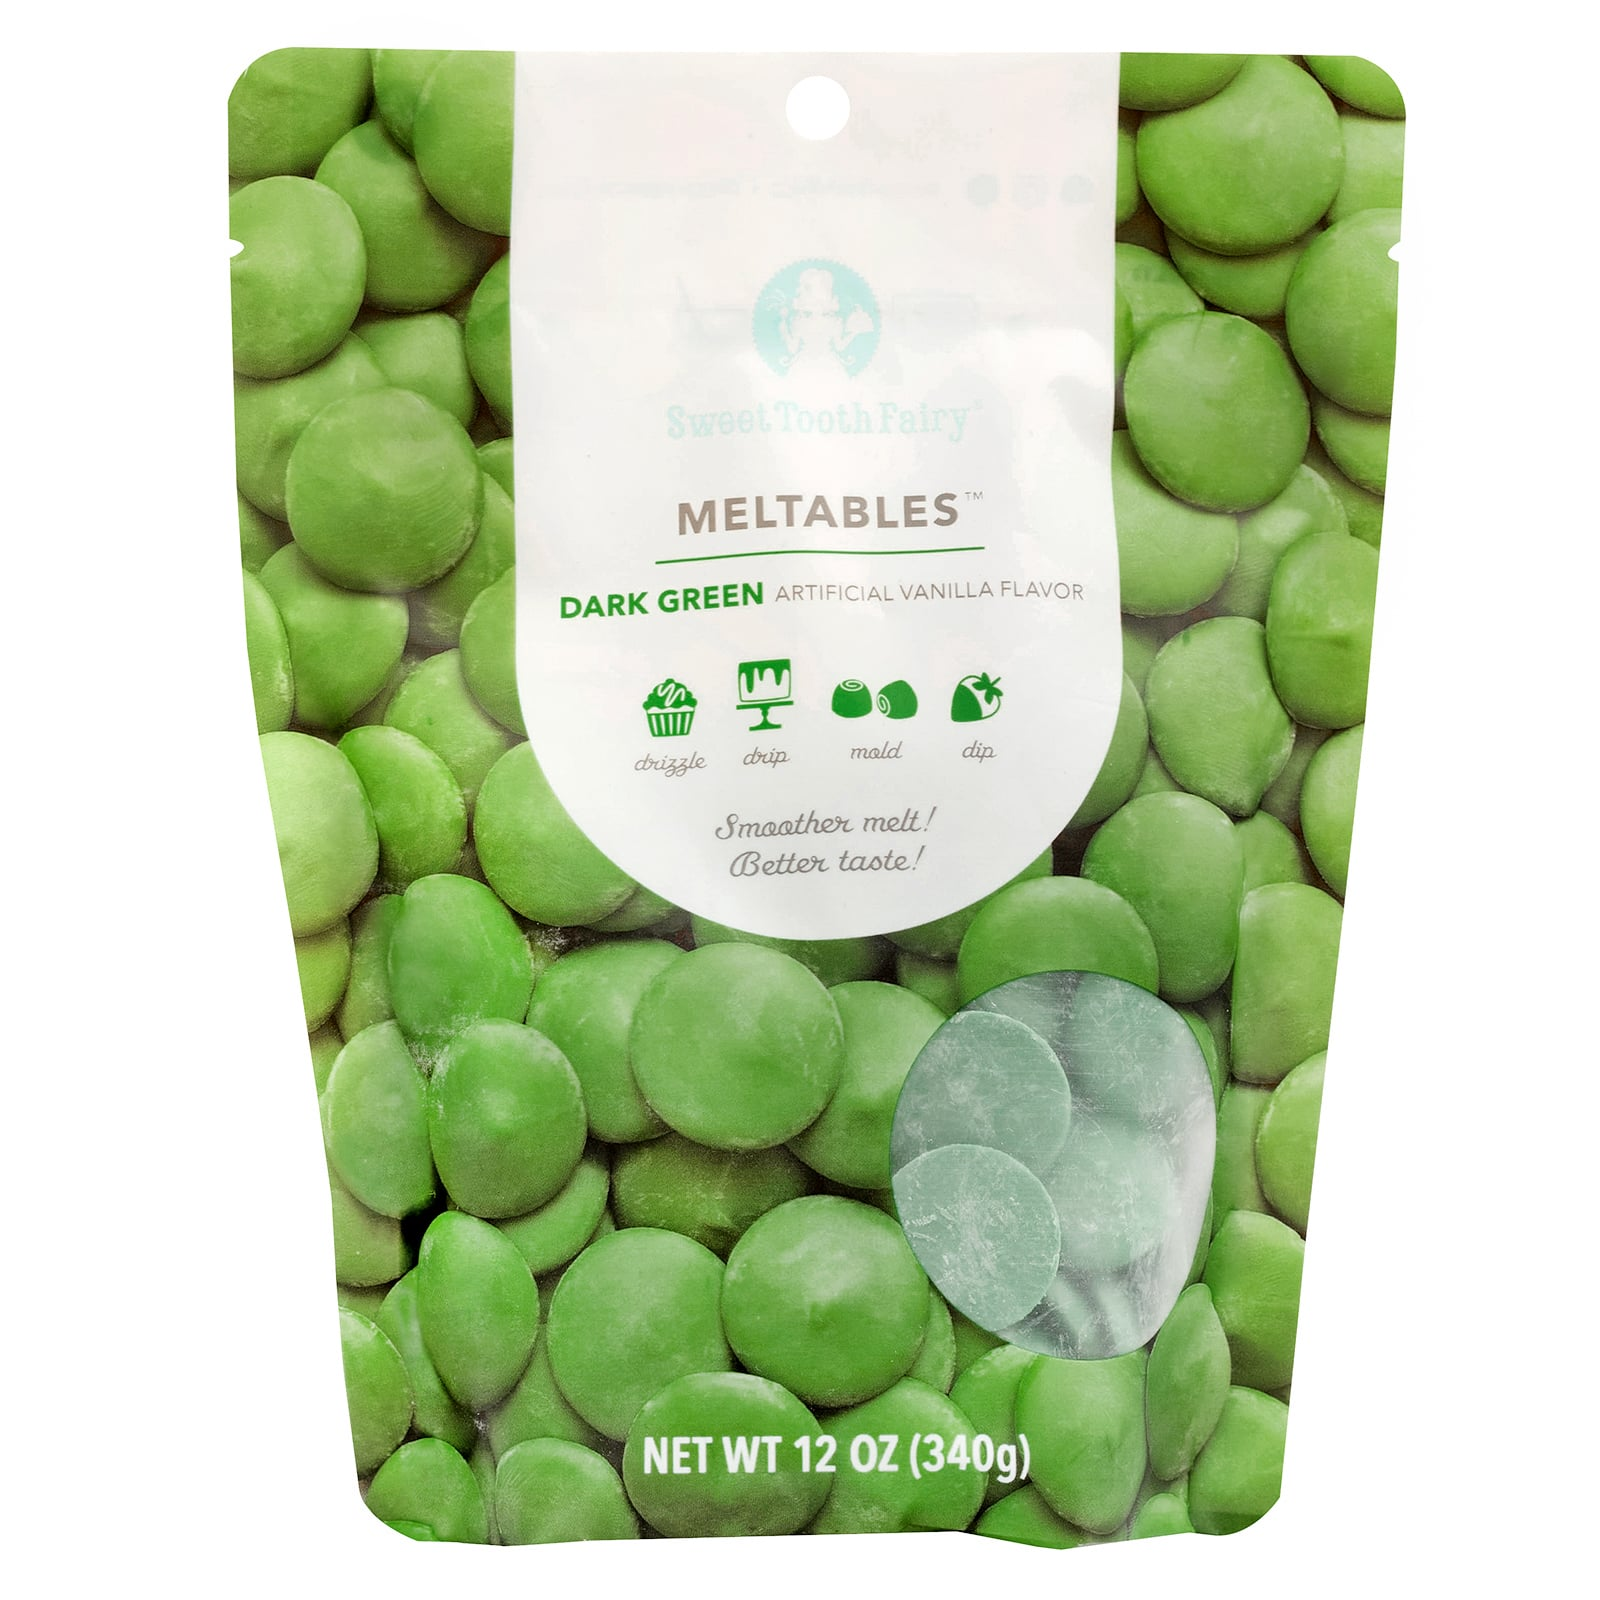 sweet tooth fairy dark green meltables